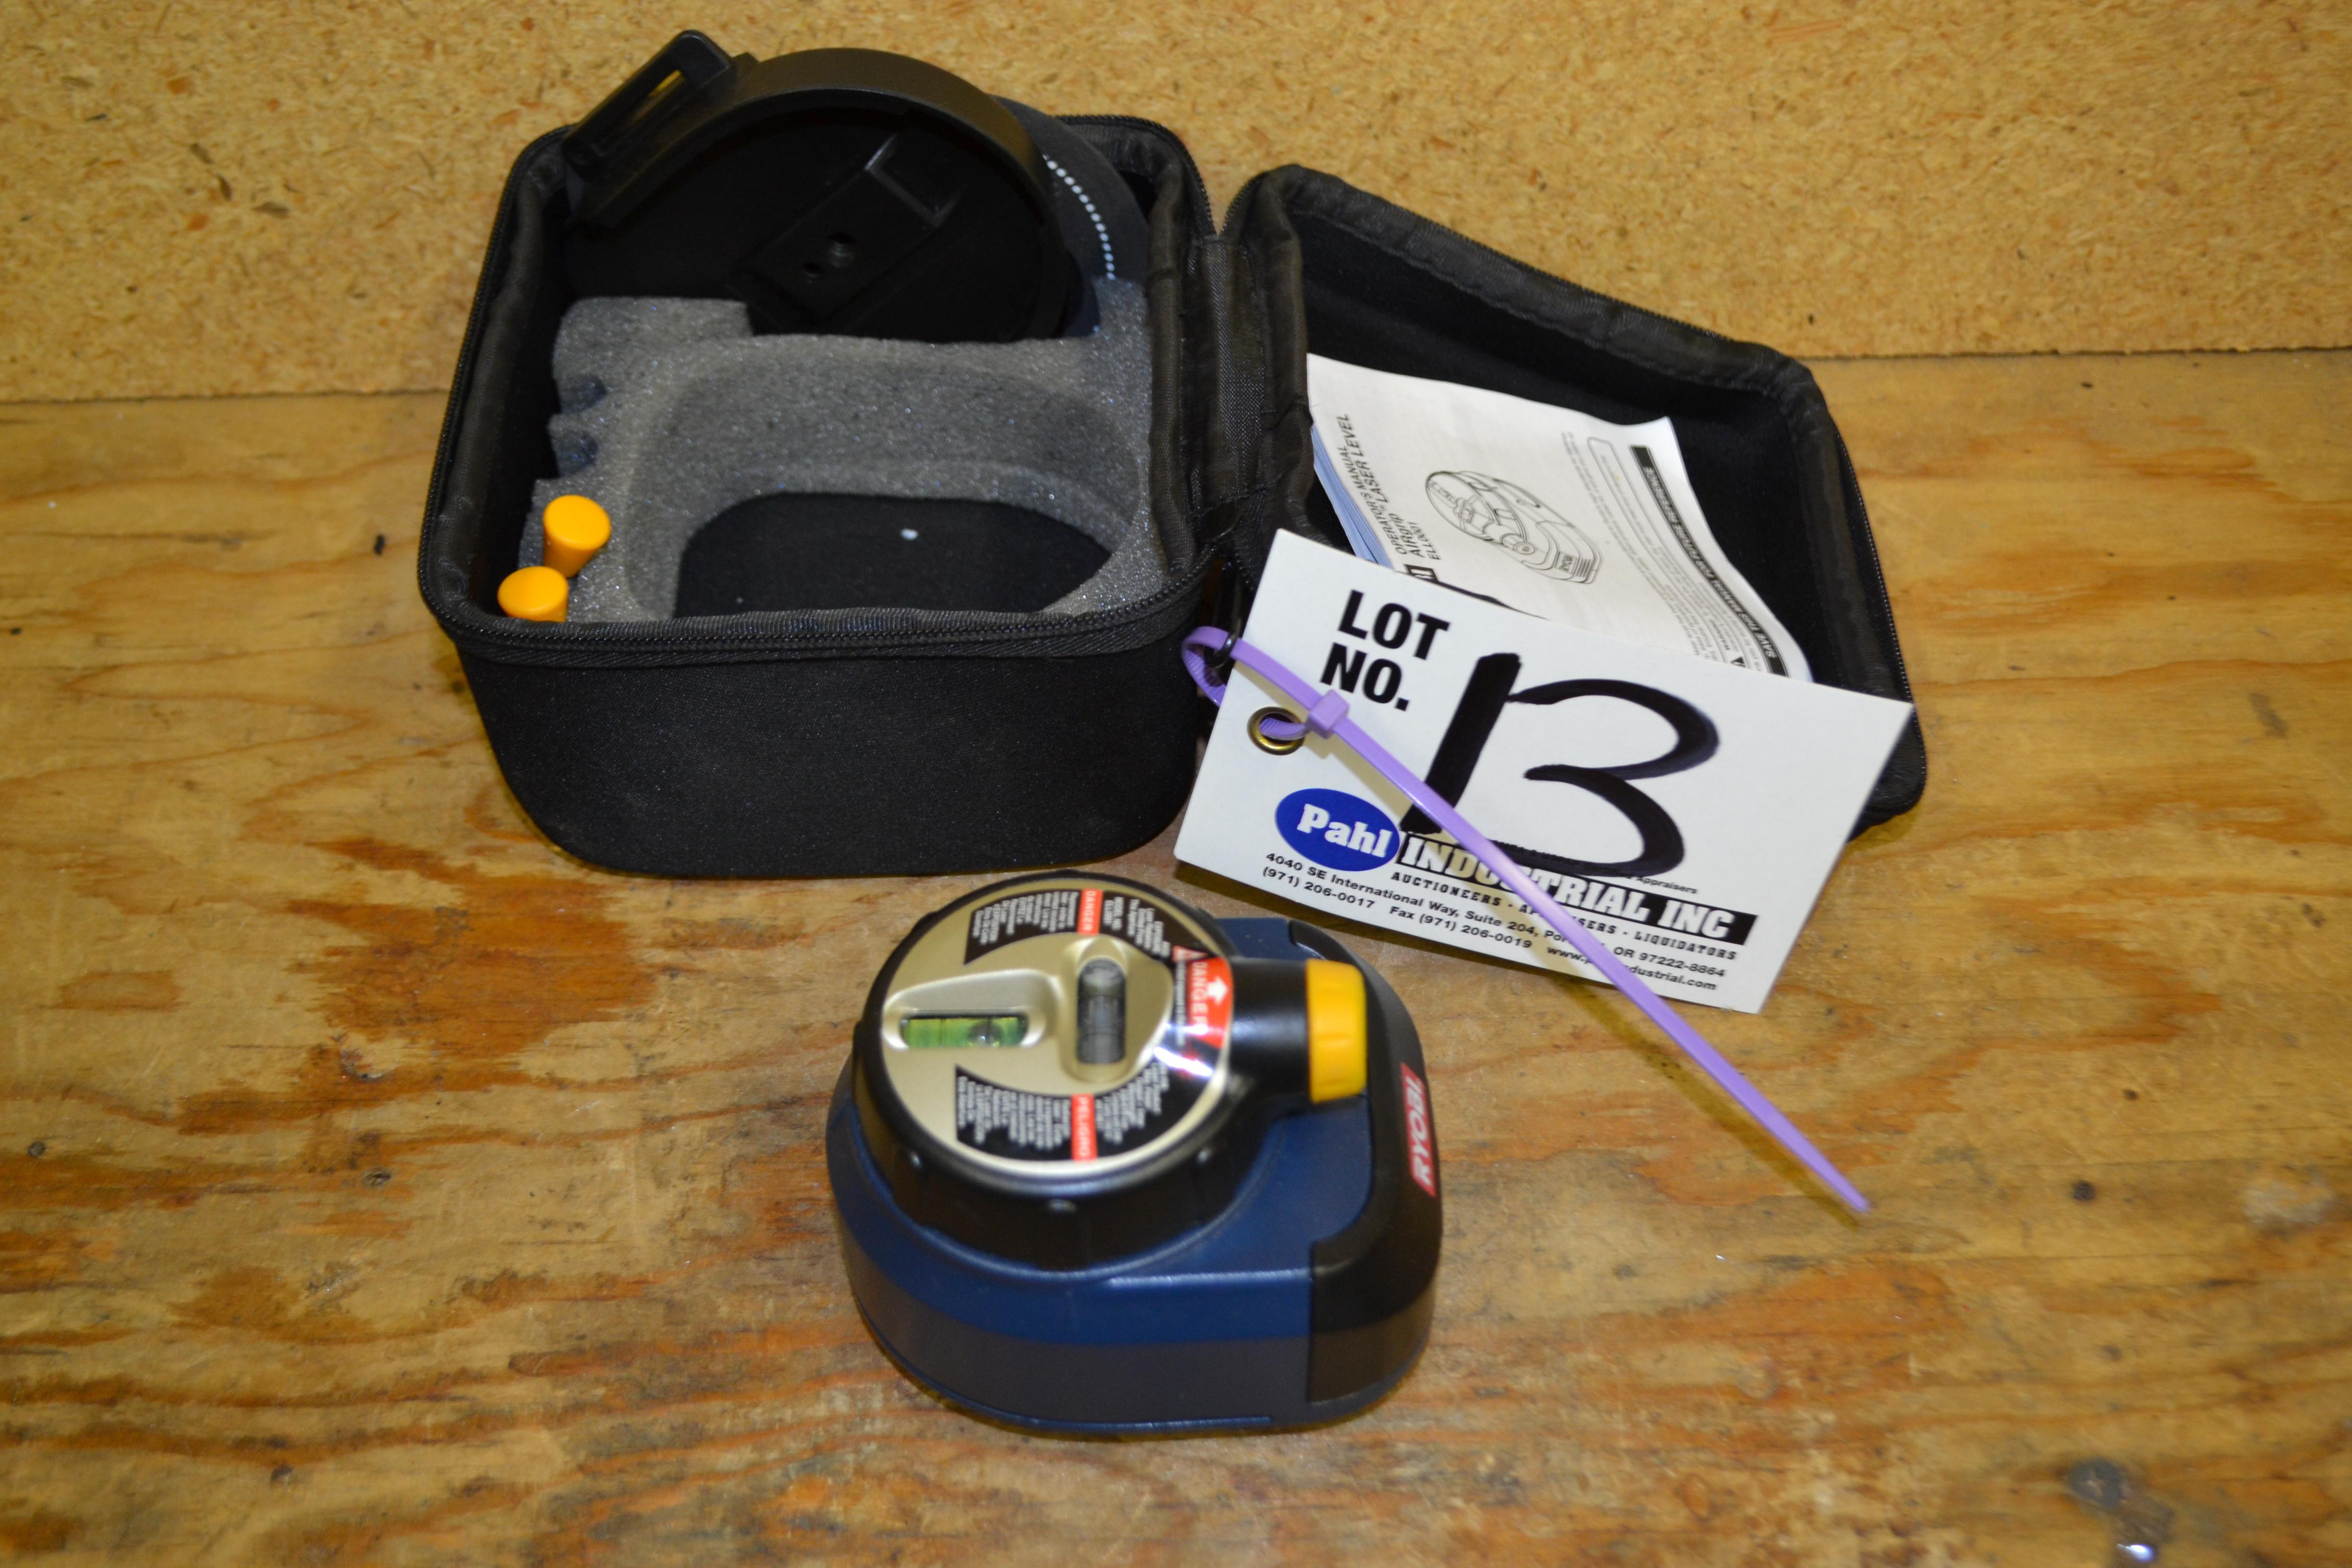 Ryobi ELL0001 Airgrip Laser Level